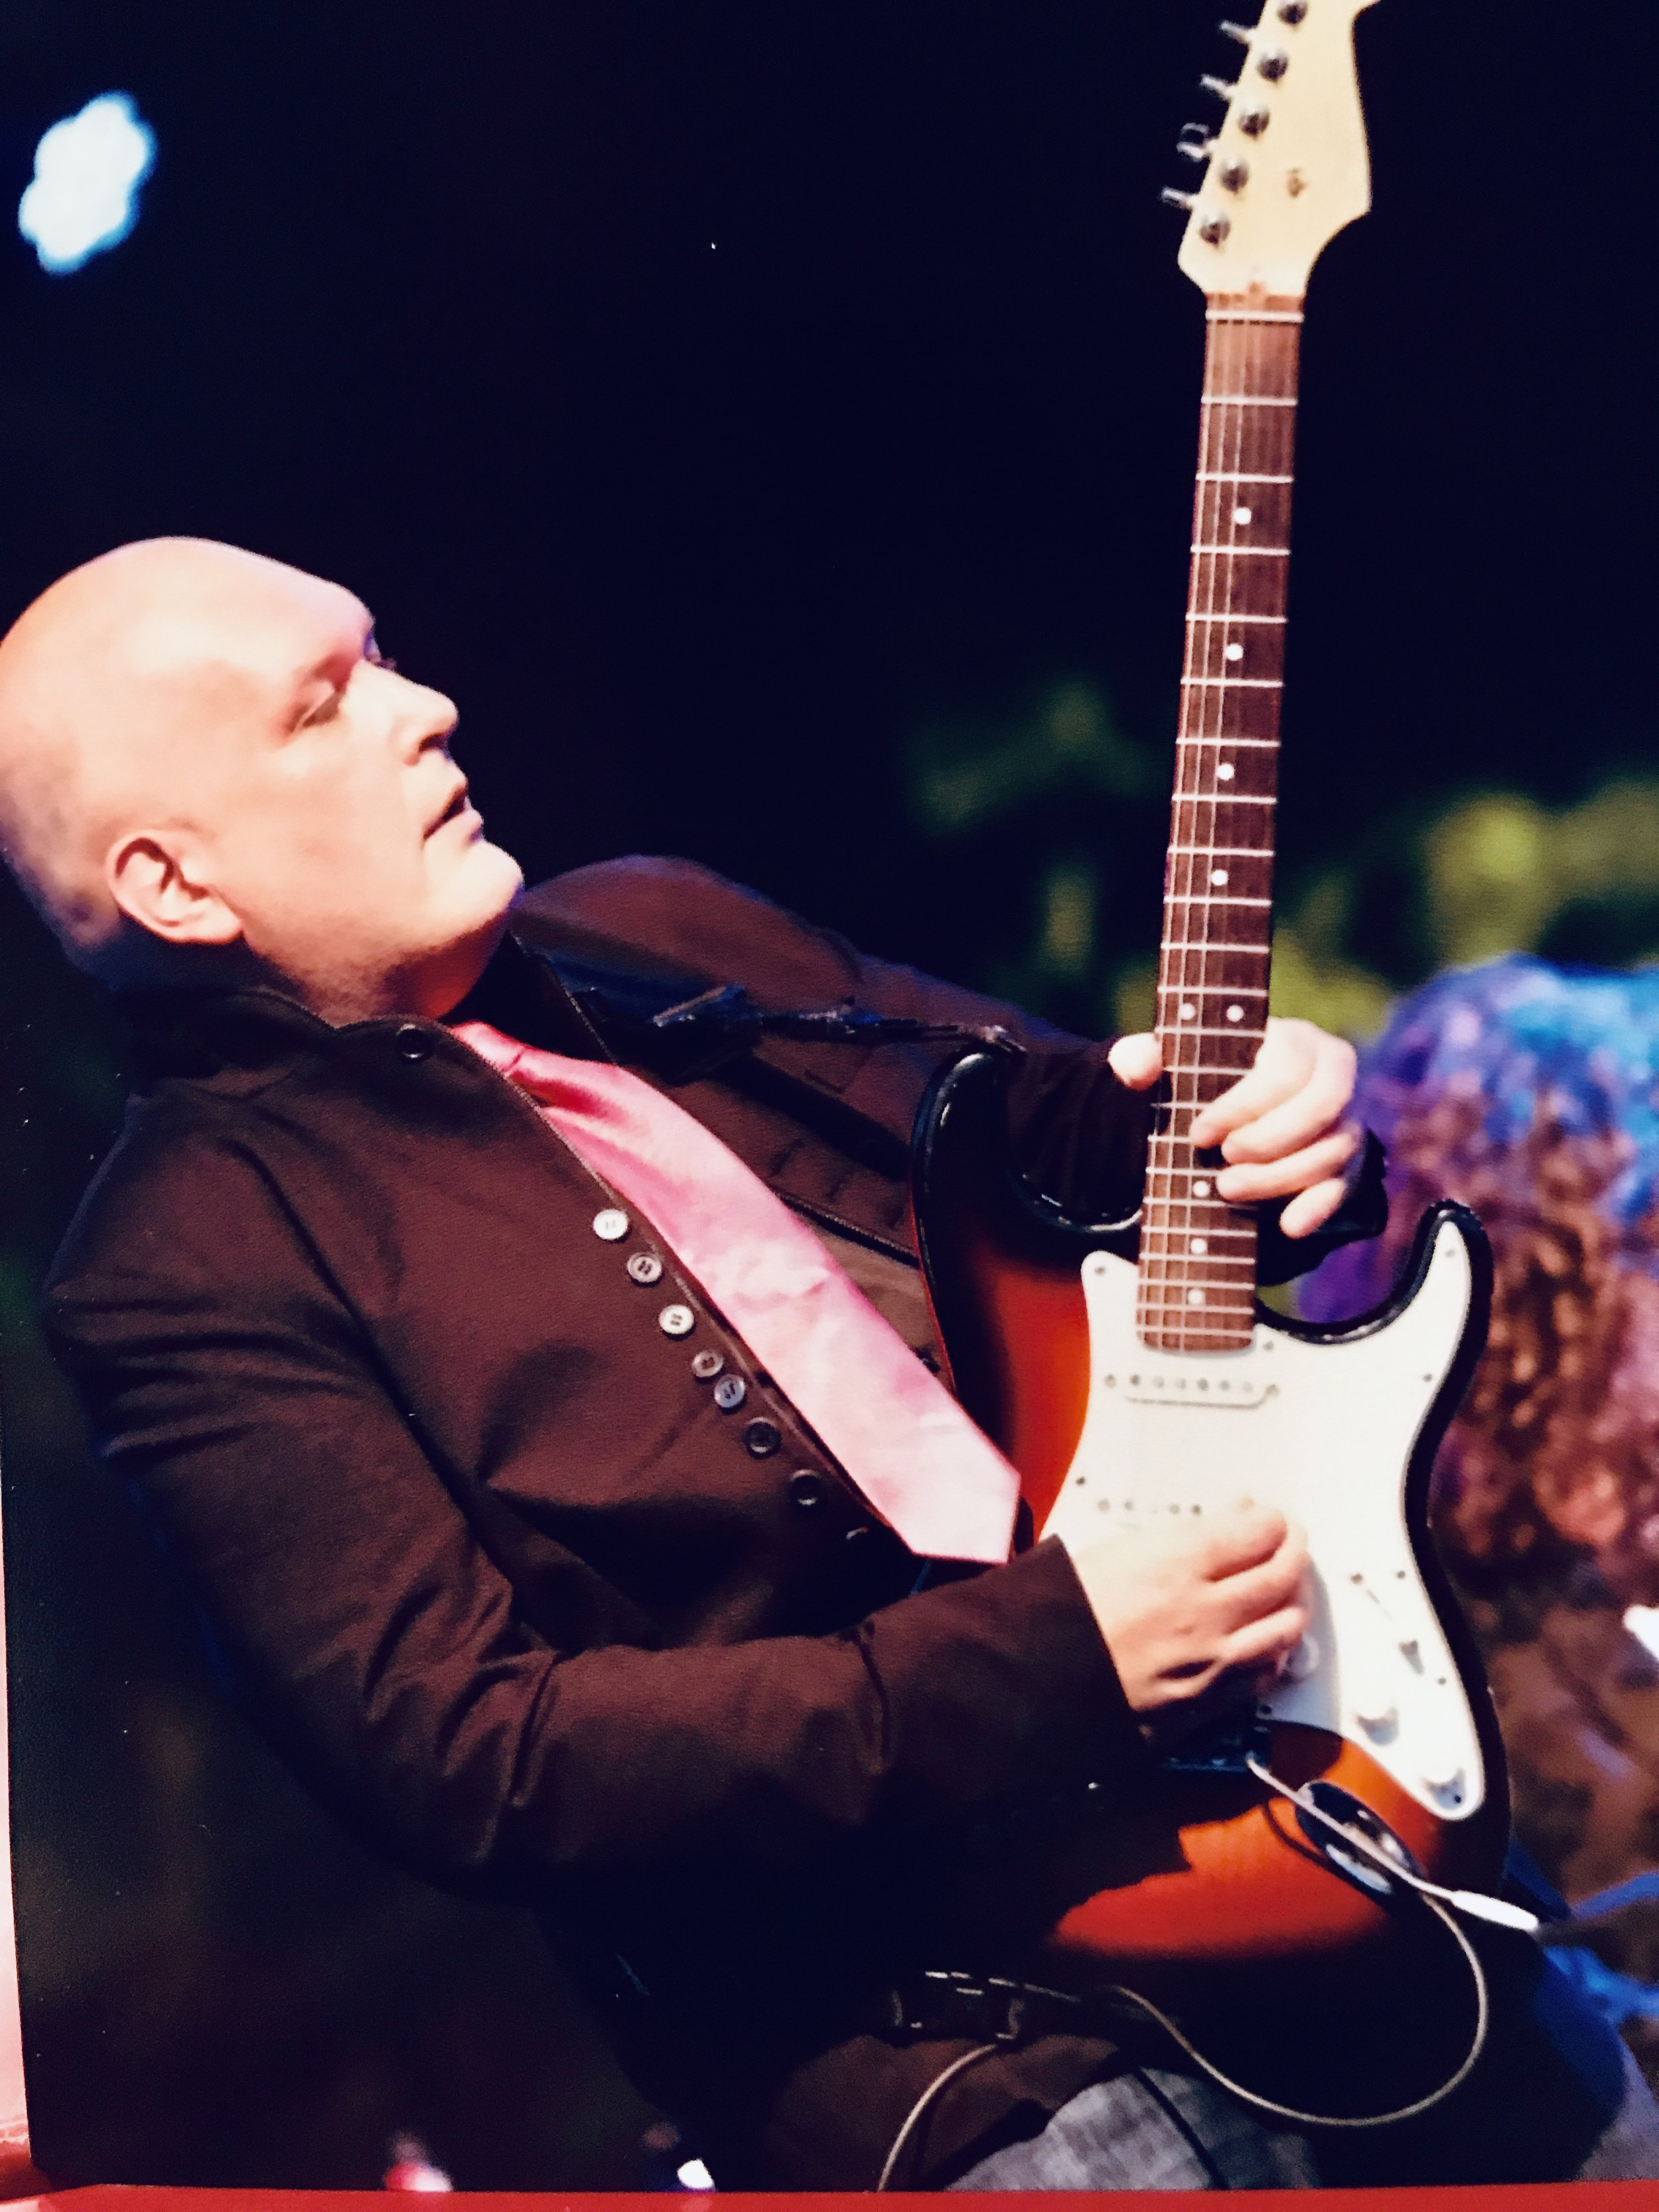 Killer guitarist, Russell Gray.